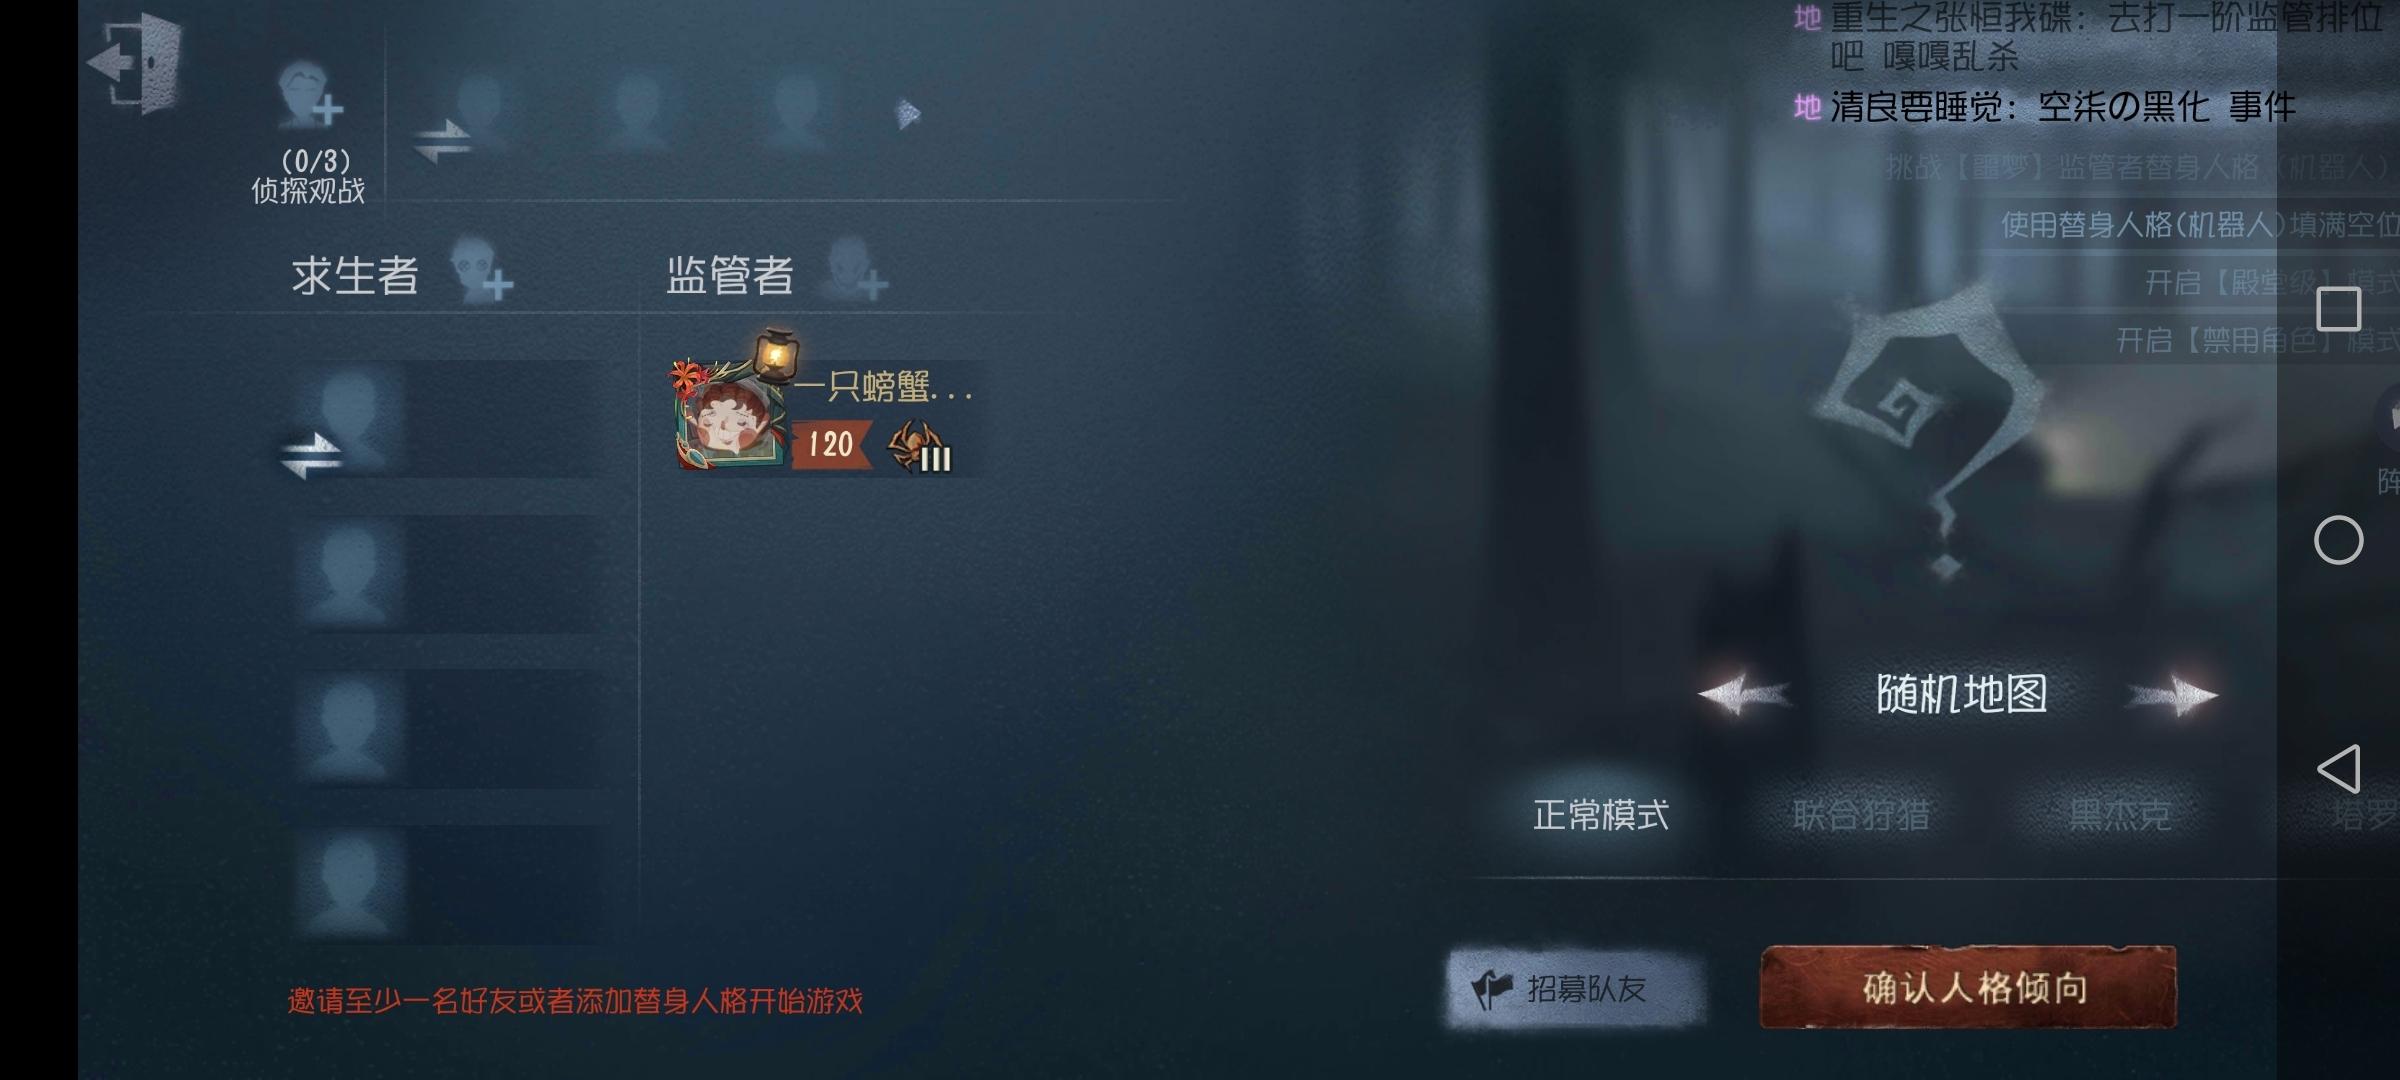 Screenshot_20210611_204957_com.netease.dwrg.huawei.jpg